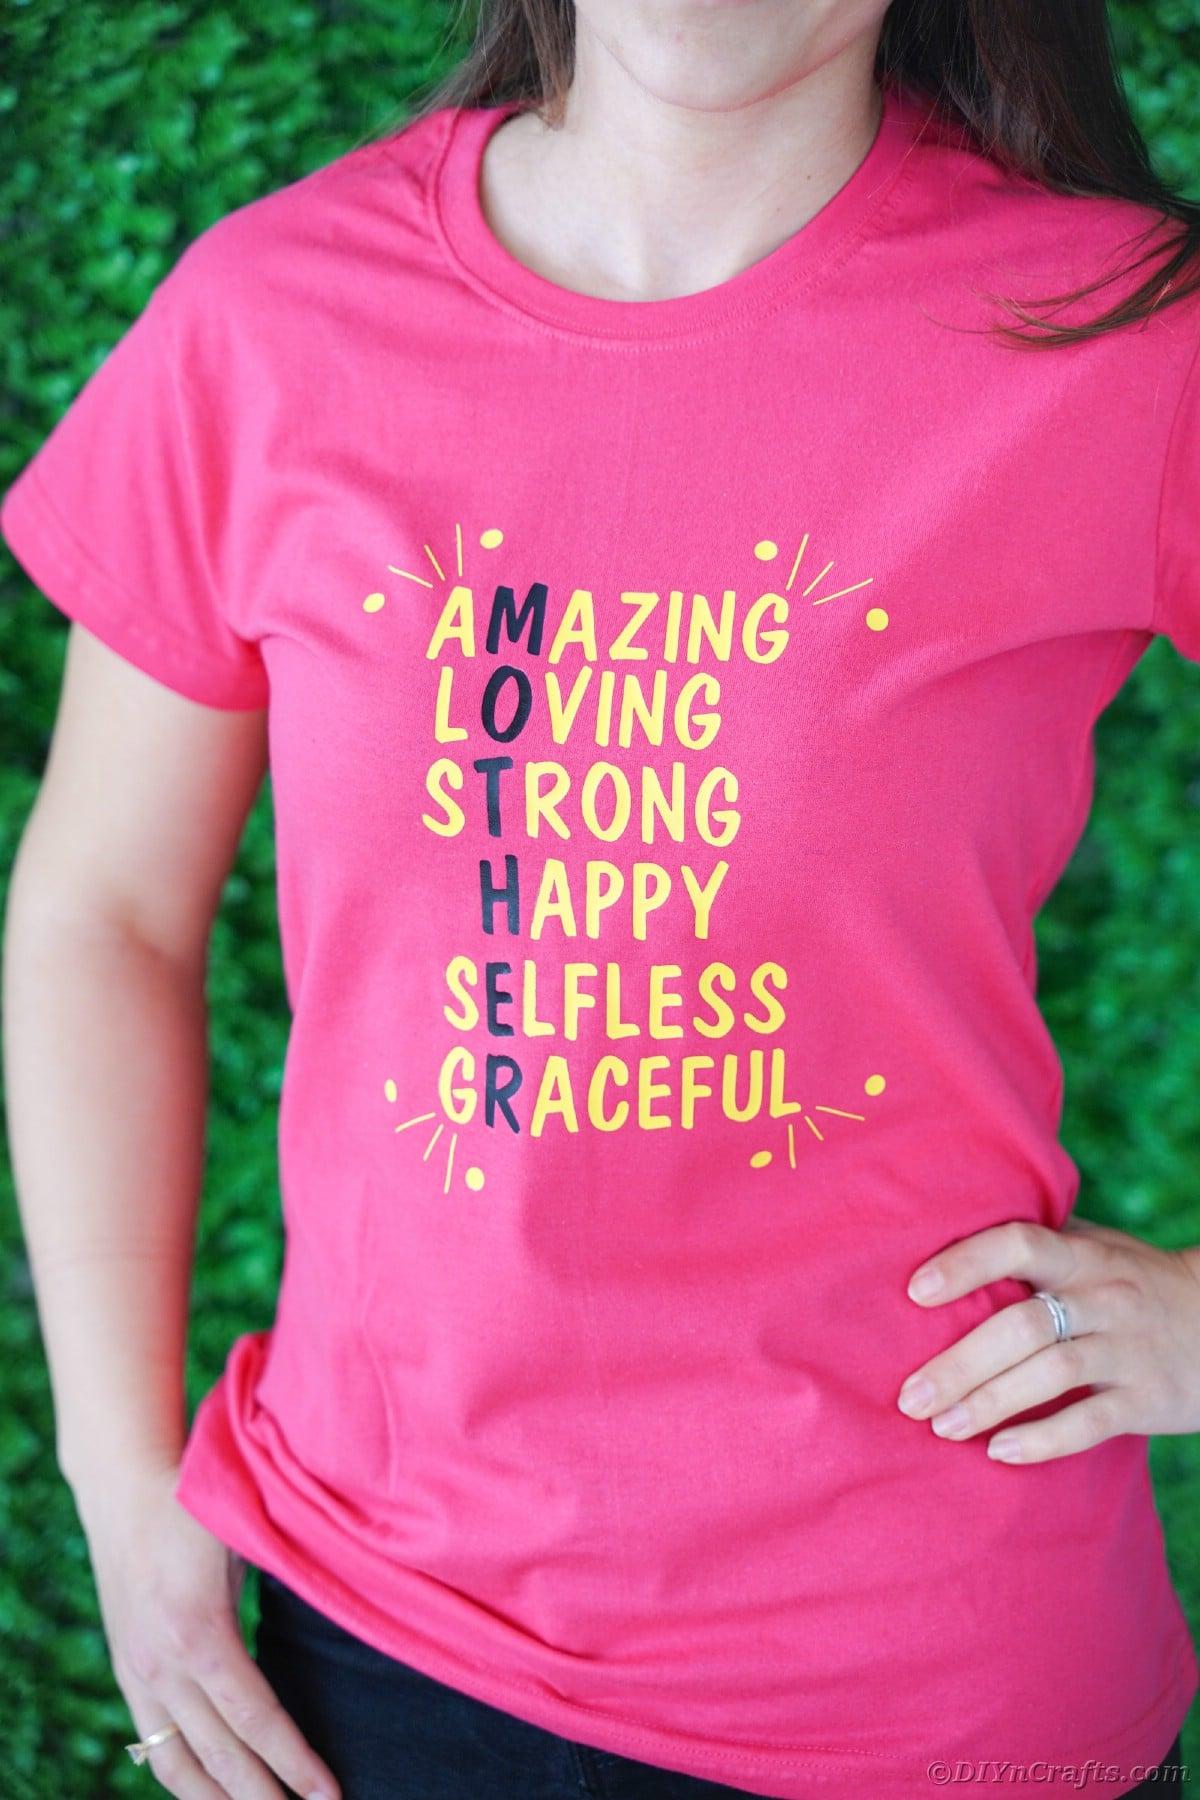 Pink t-shirt on woman agianst green shrub